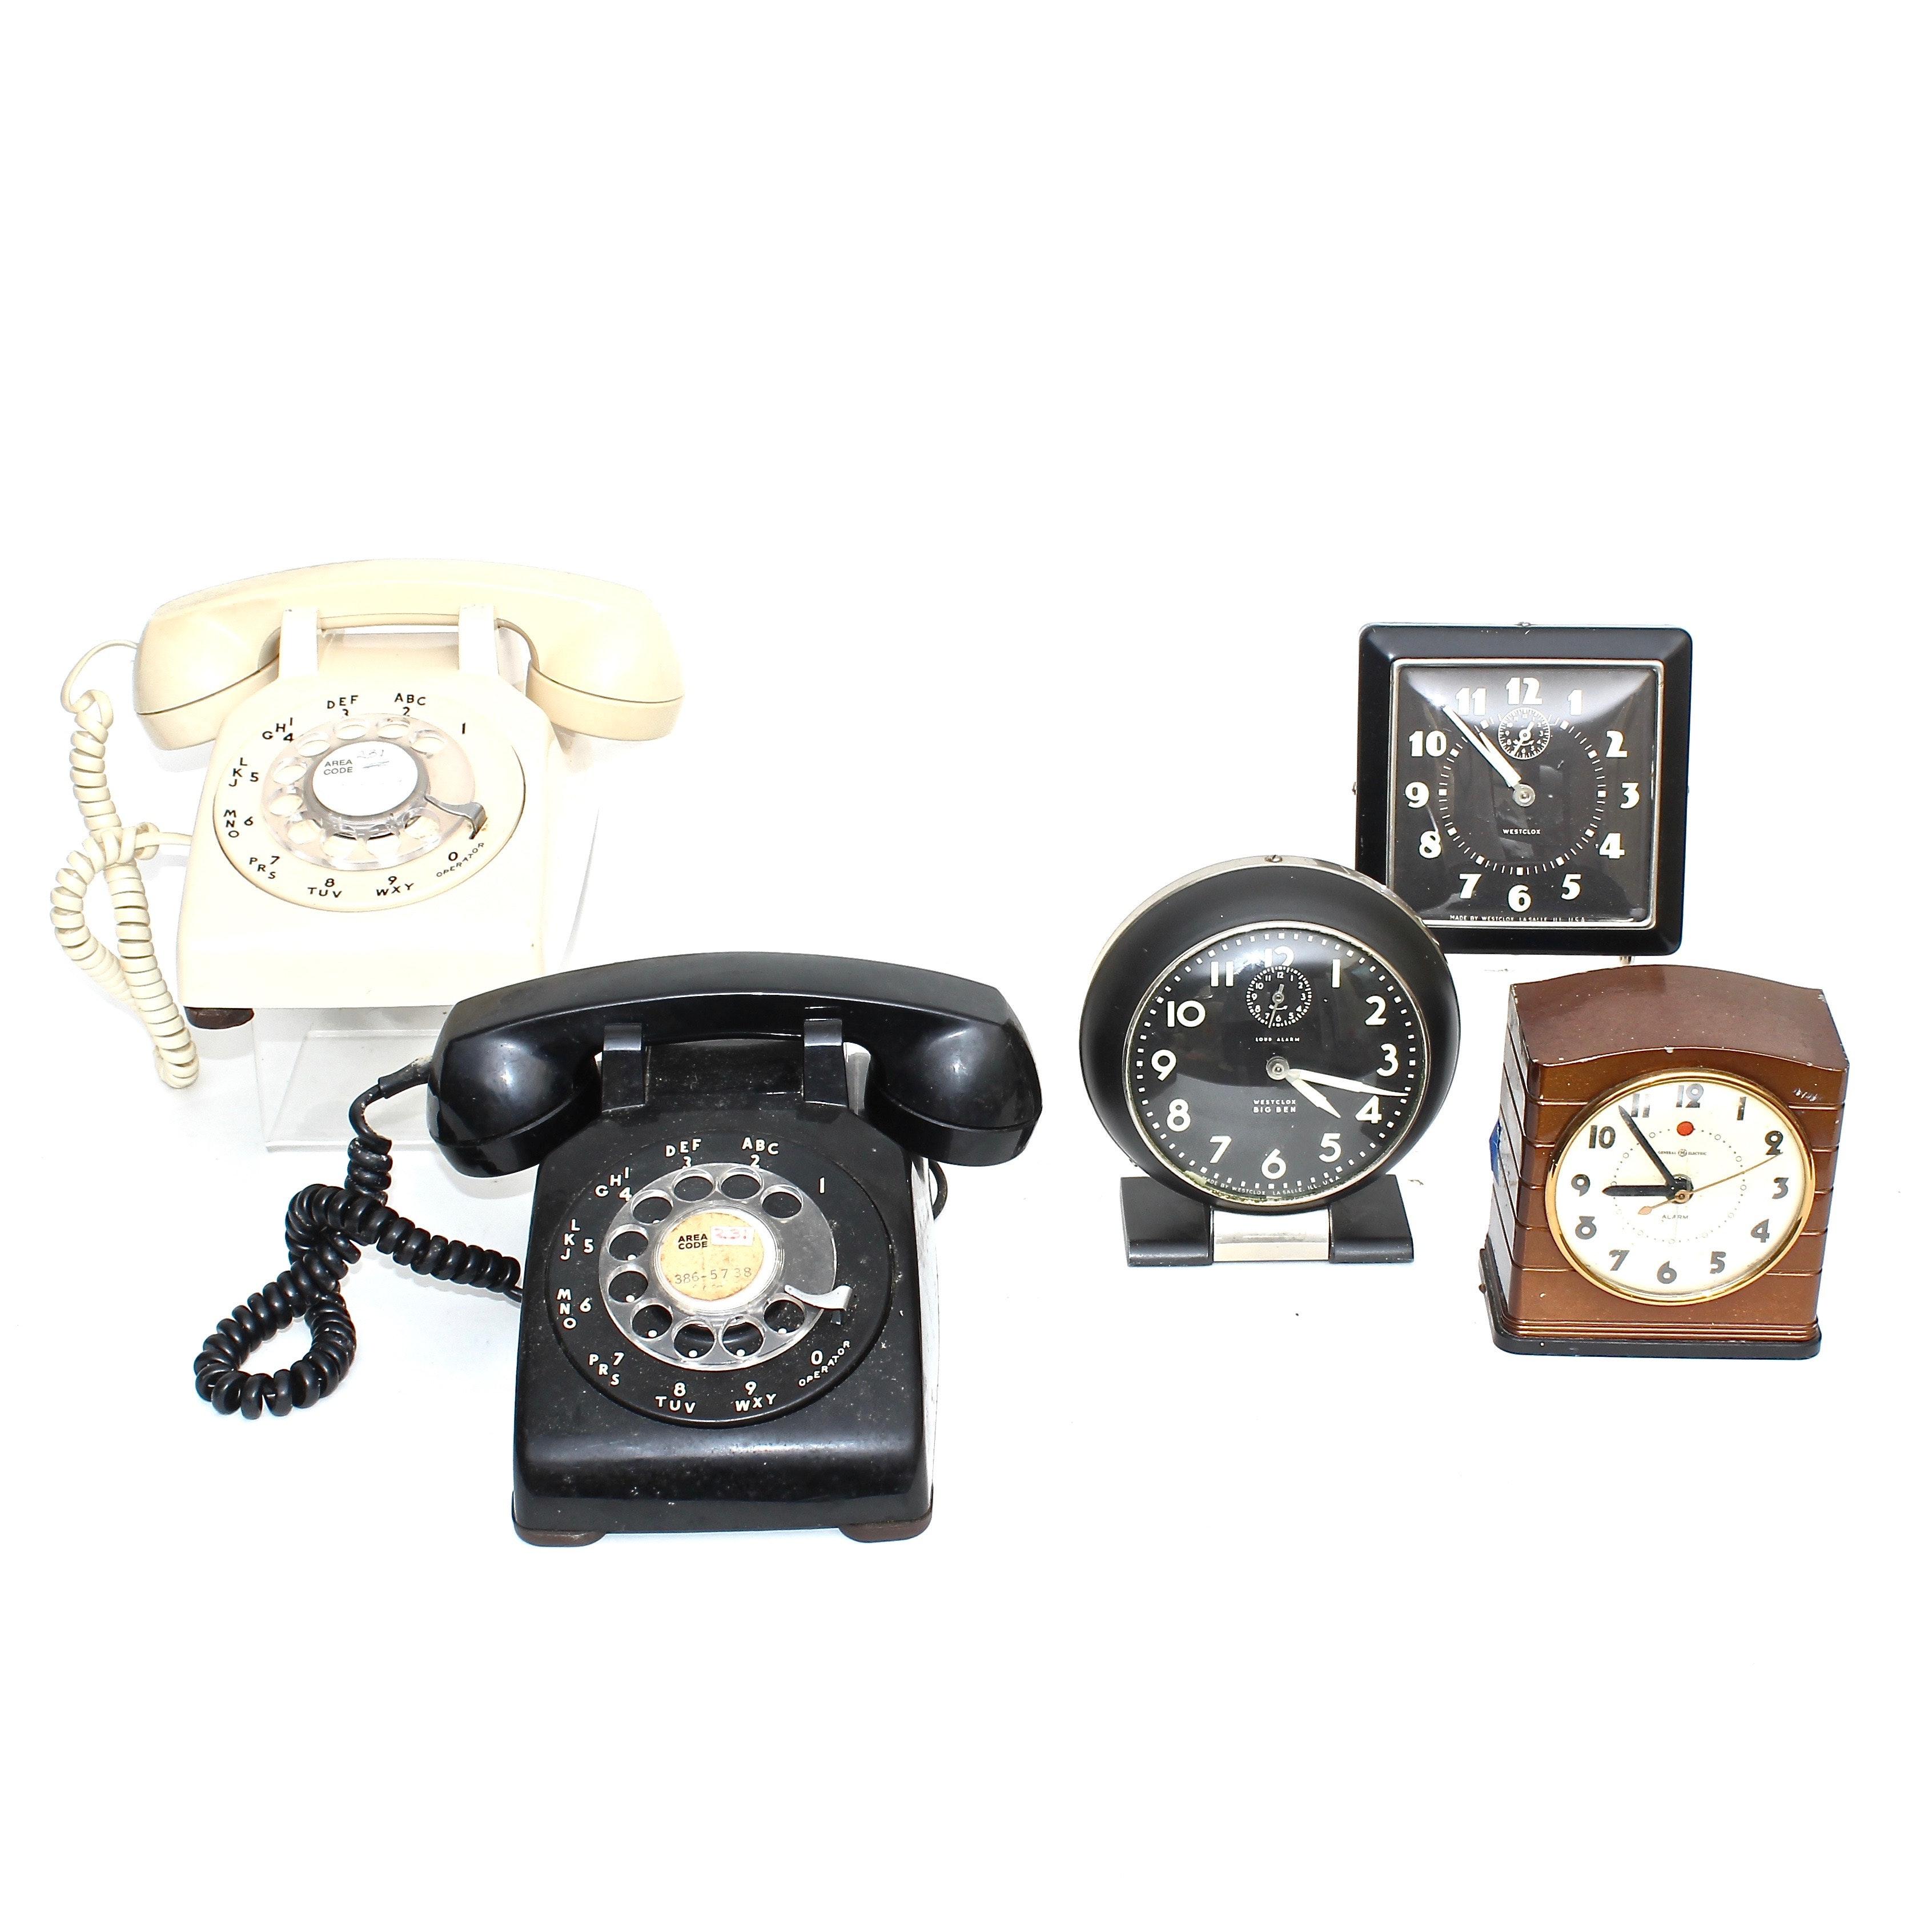 Vintage Rotary Phones and Alarm Clocks Including Westclox Big Ben